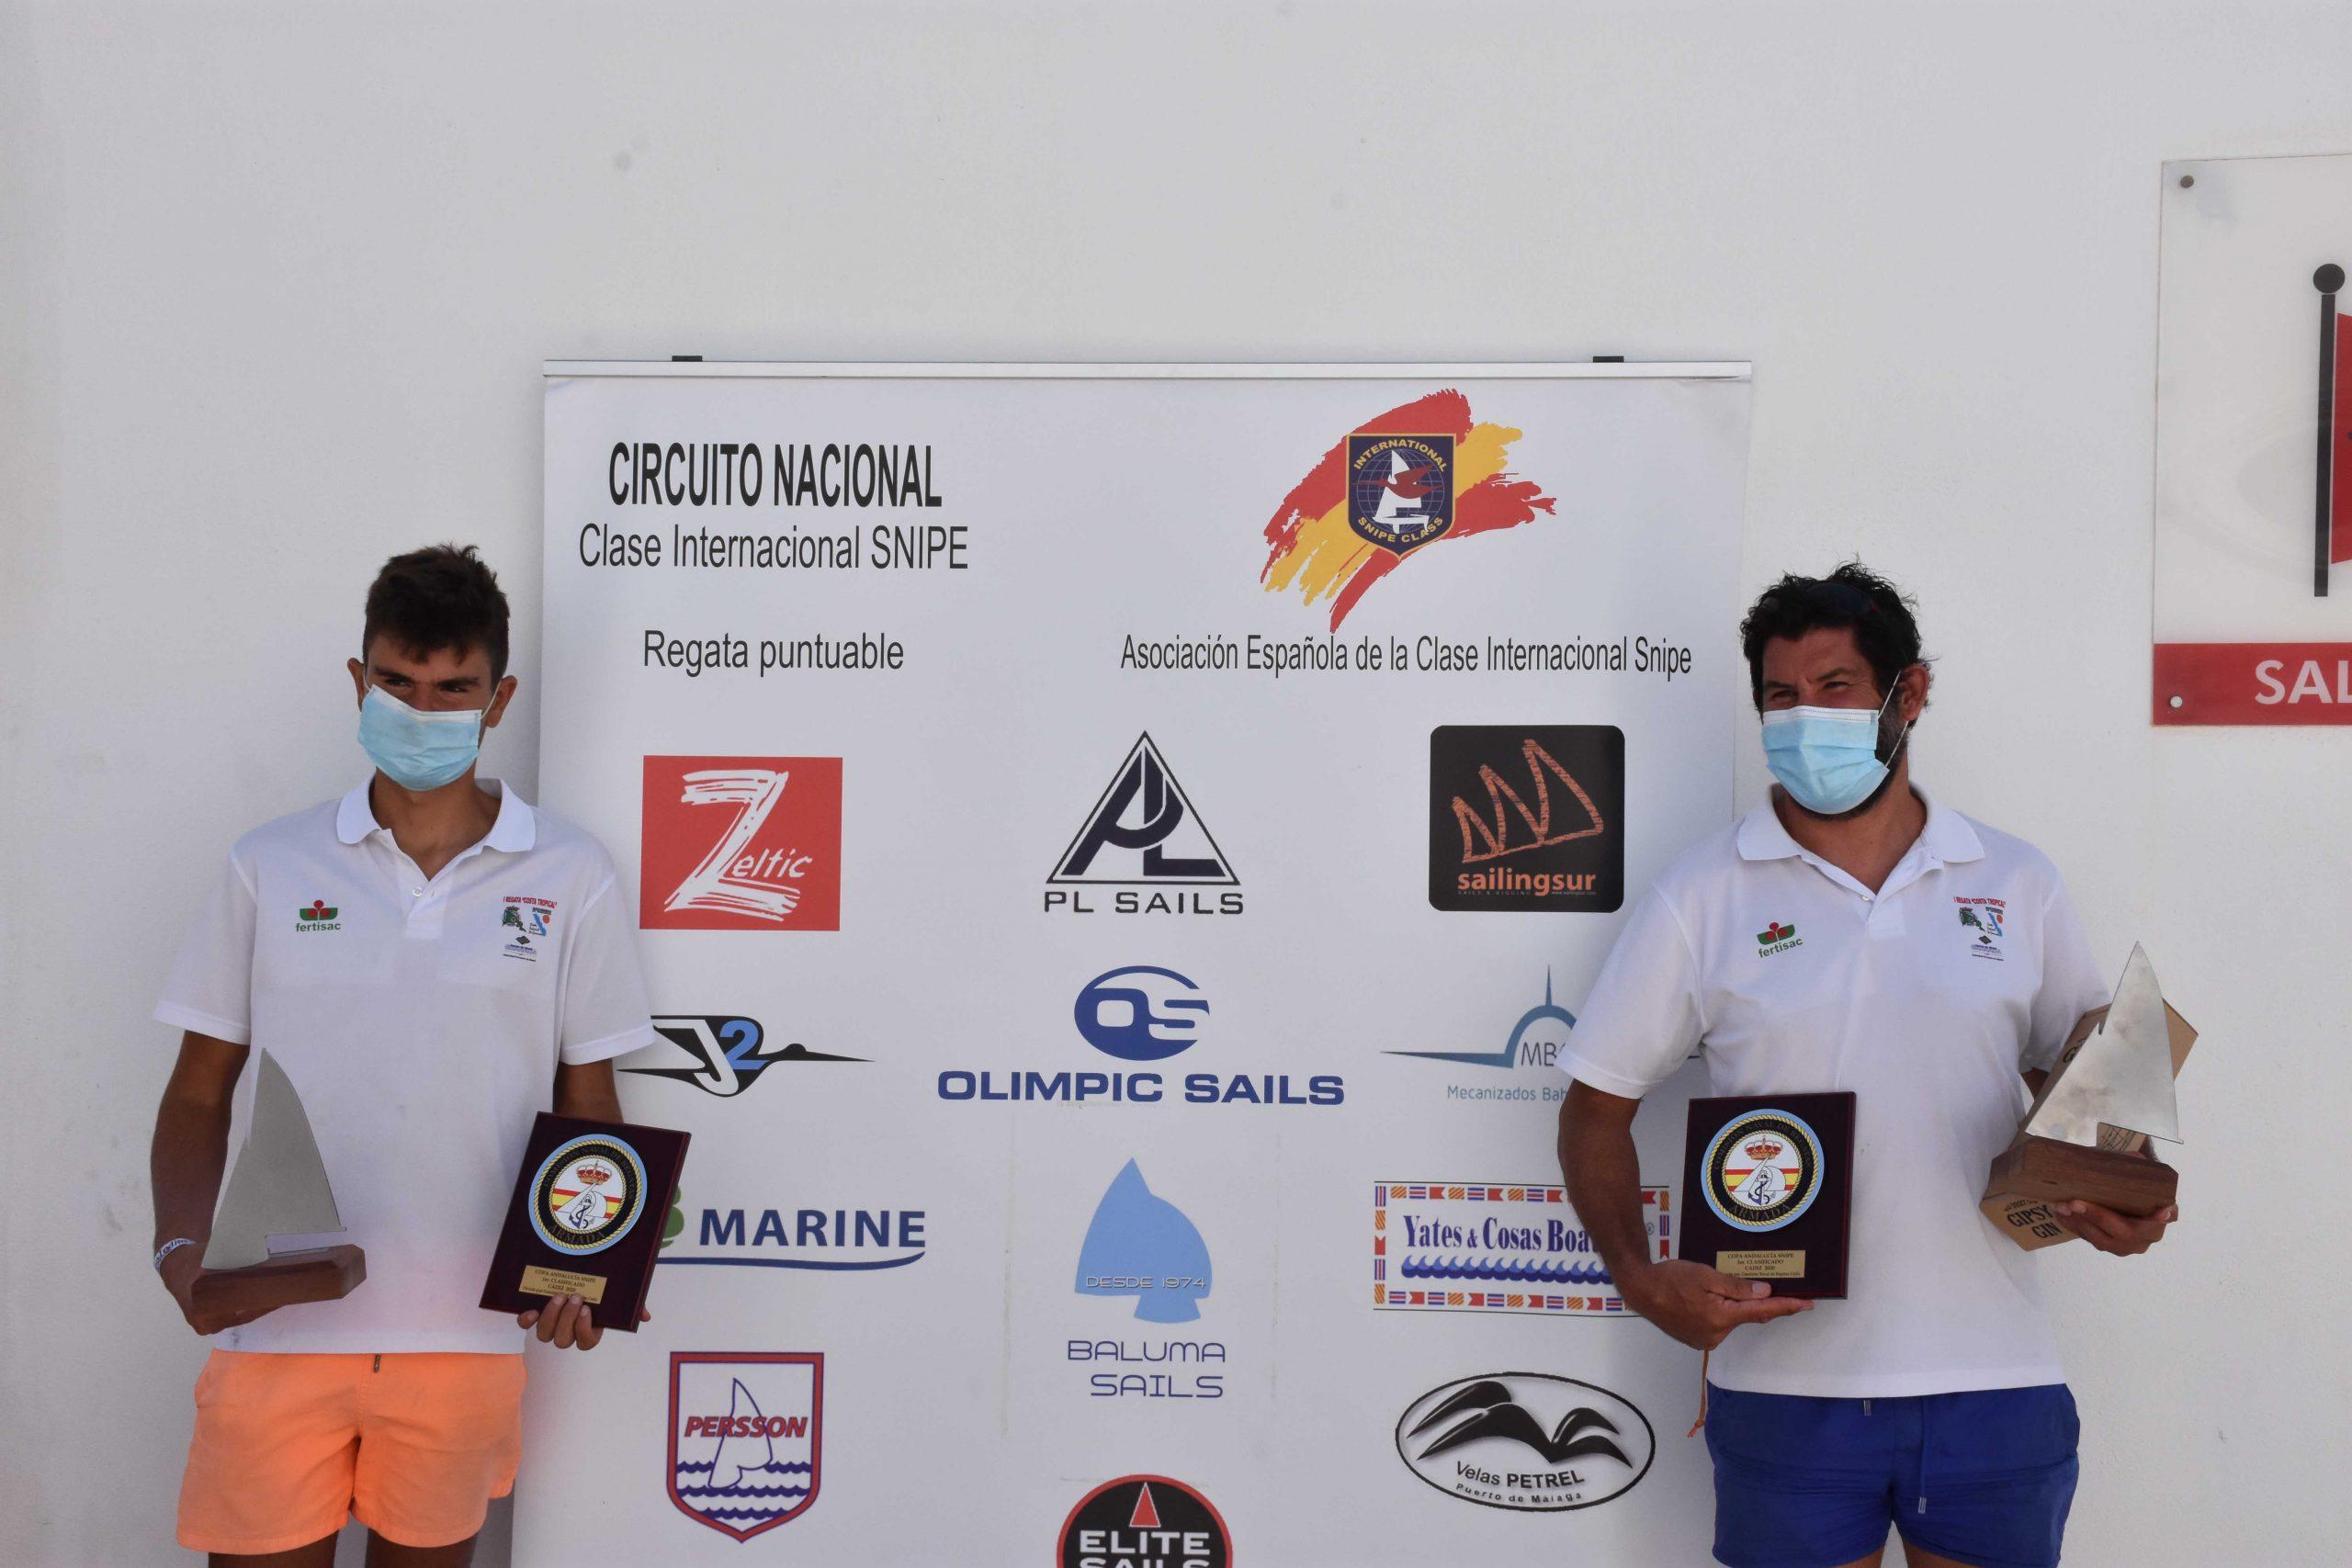 Copa De Andalucía De Snipe, Trofeo Aniversario Flota Snipe De Cádiz